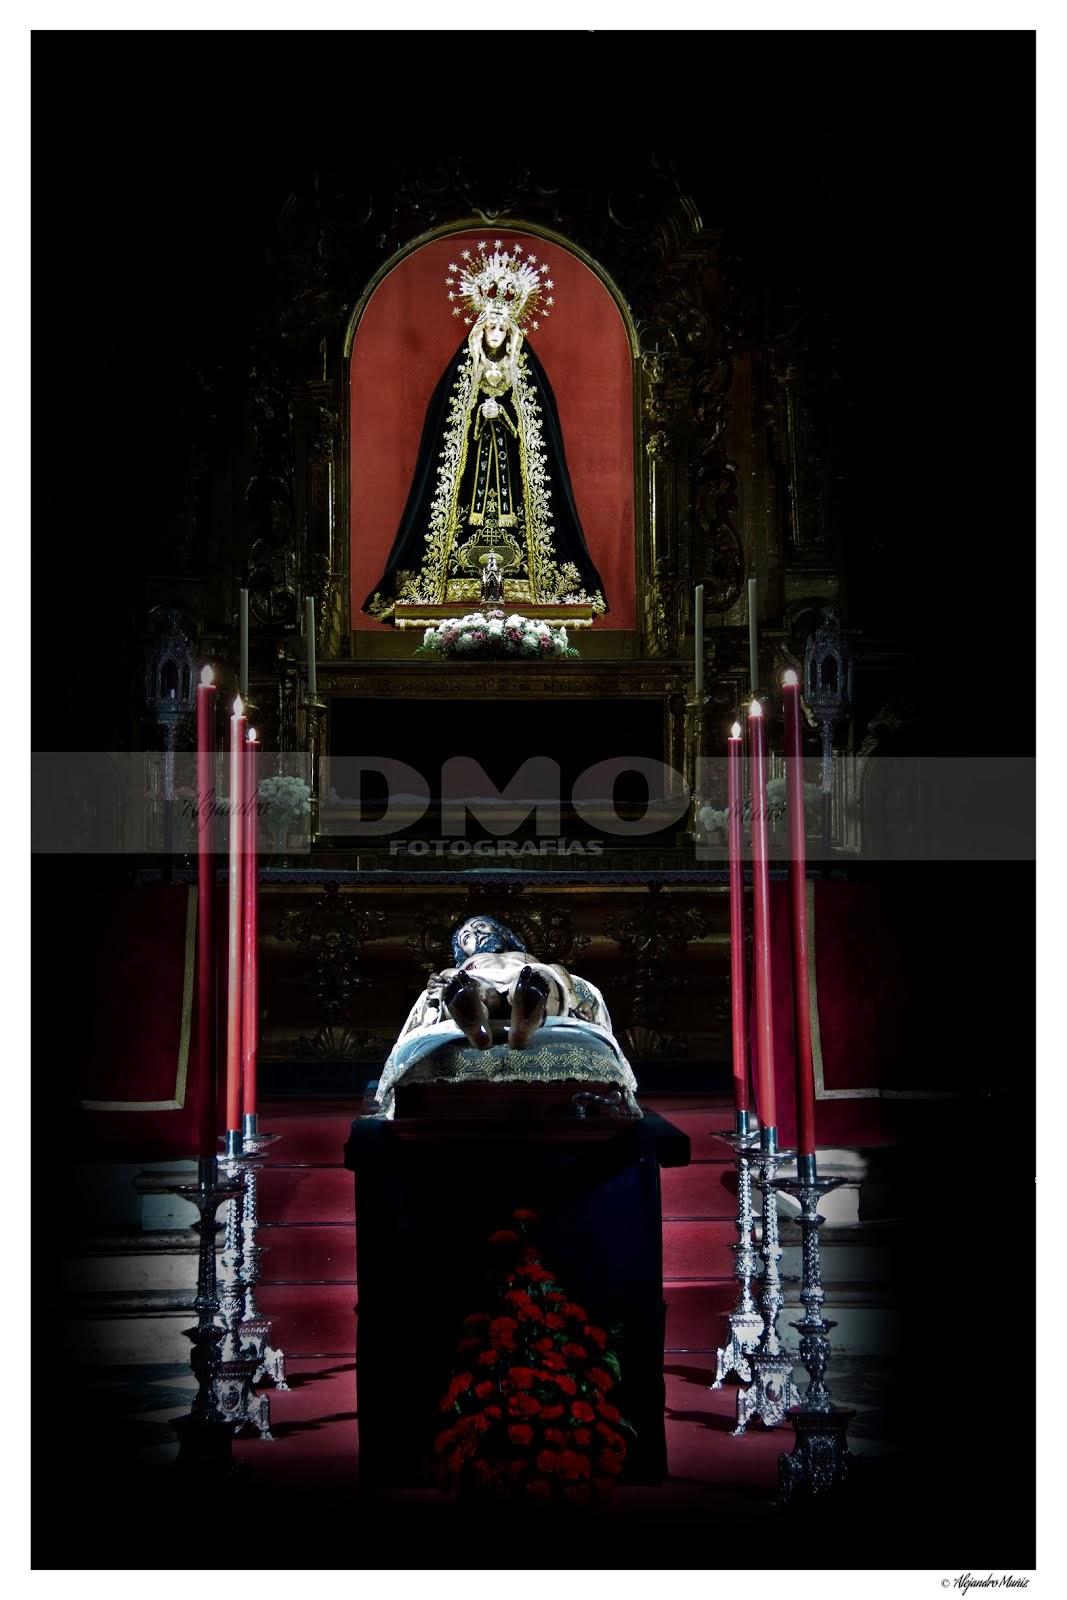 1º Premio Culto e Imágenes Hda. Santo Entierro Arahal 2013